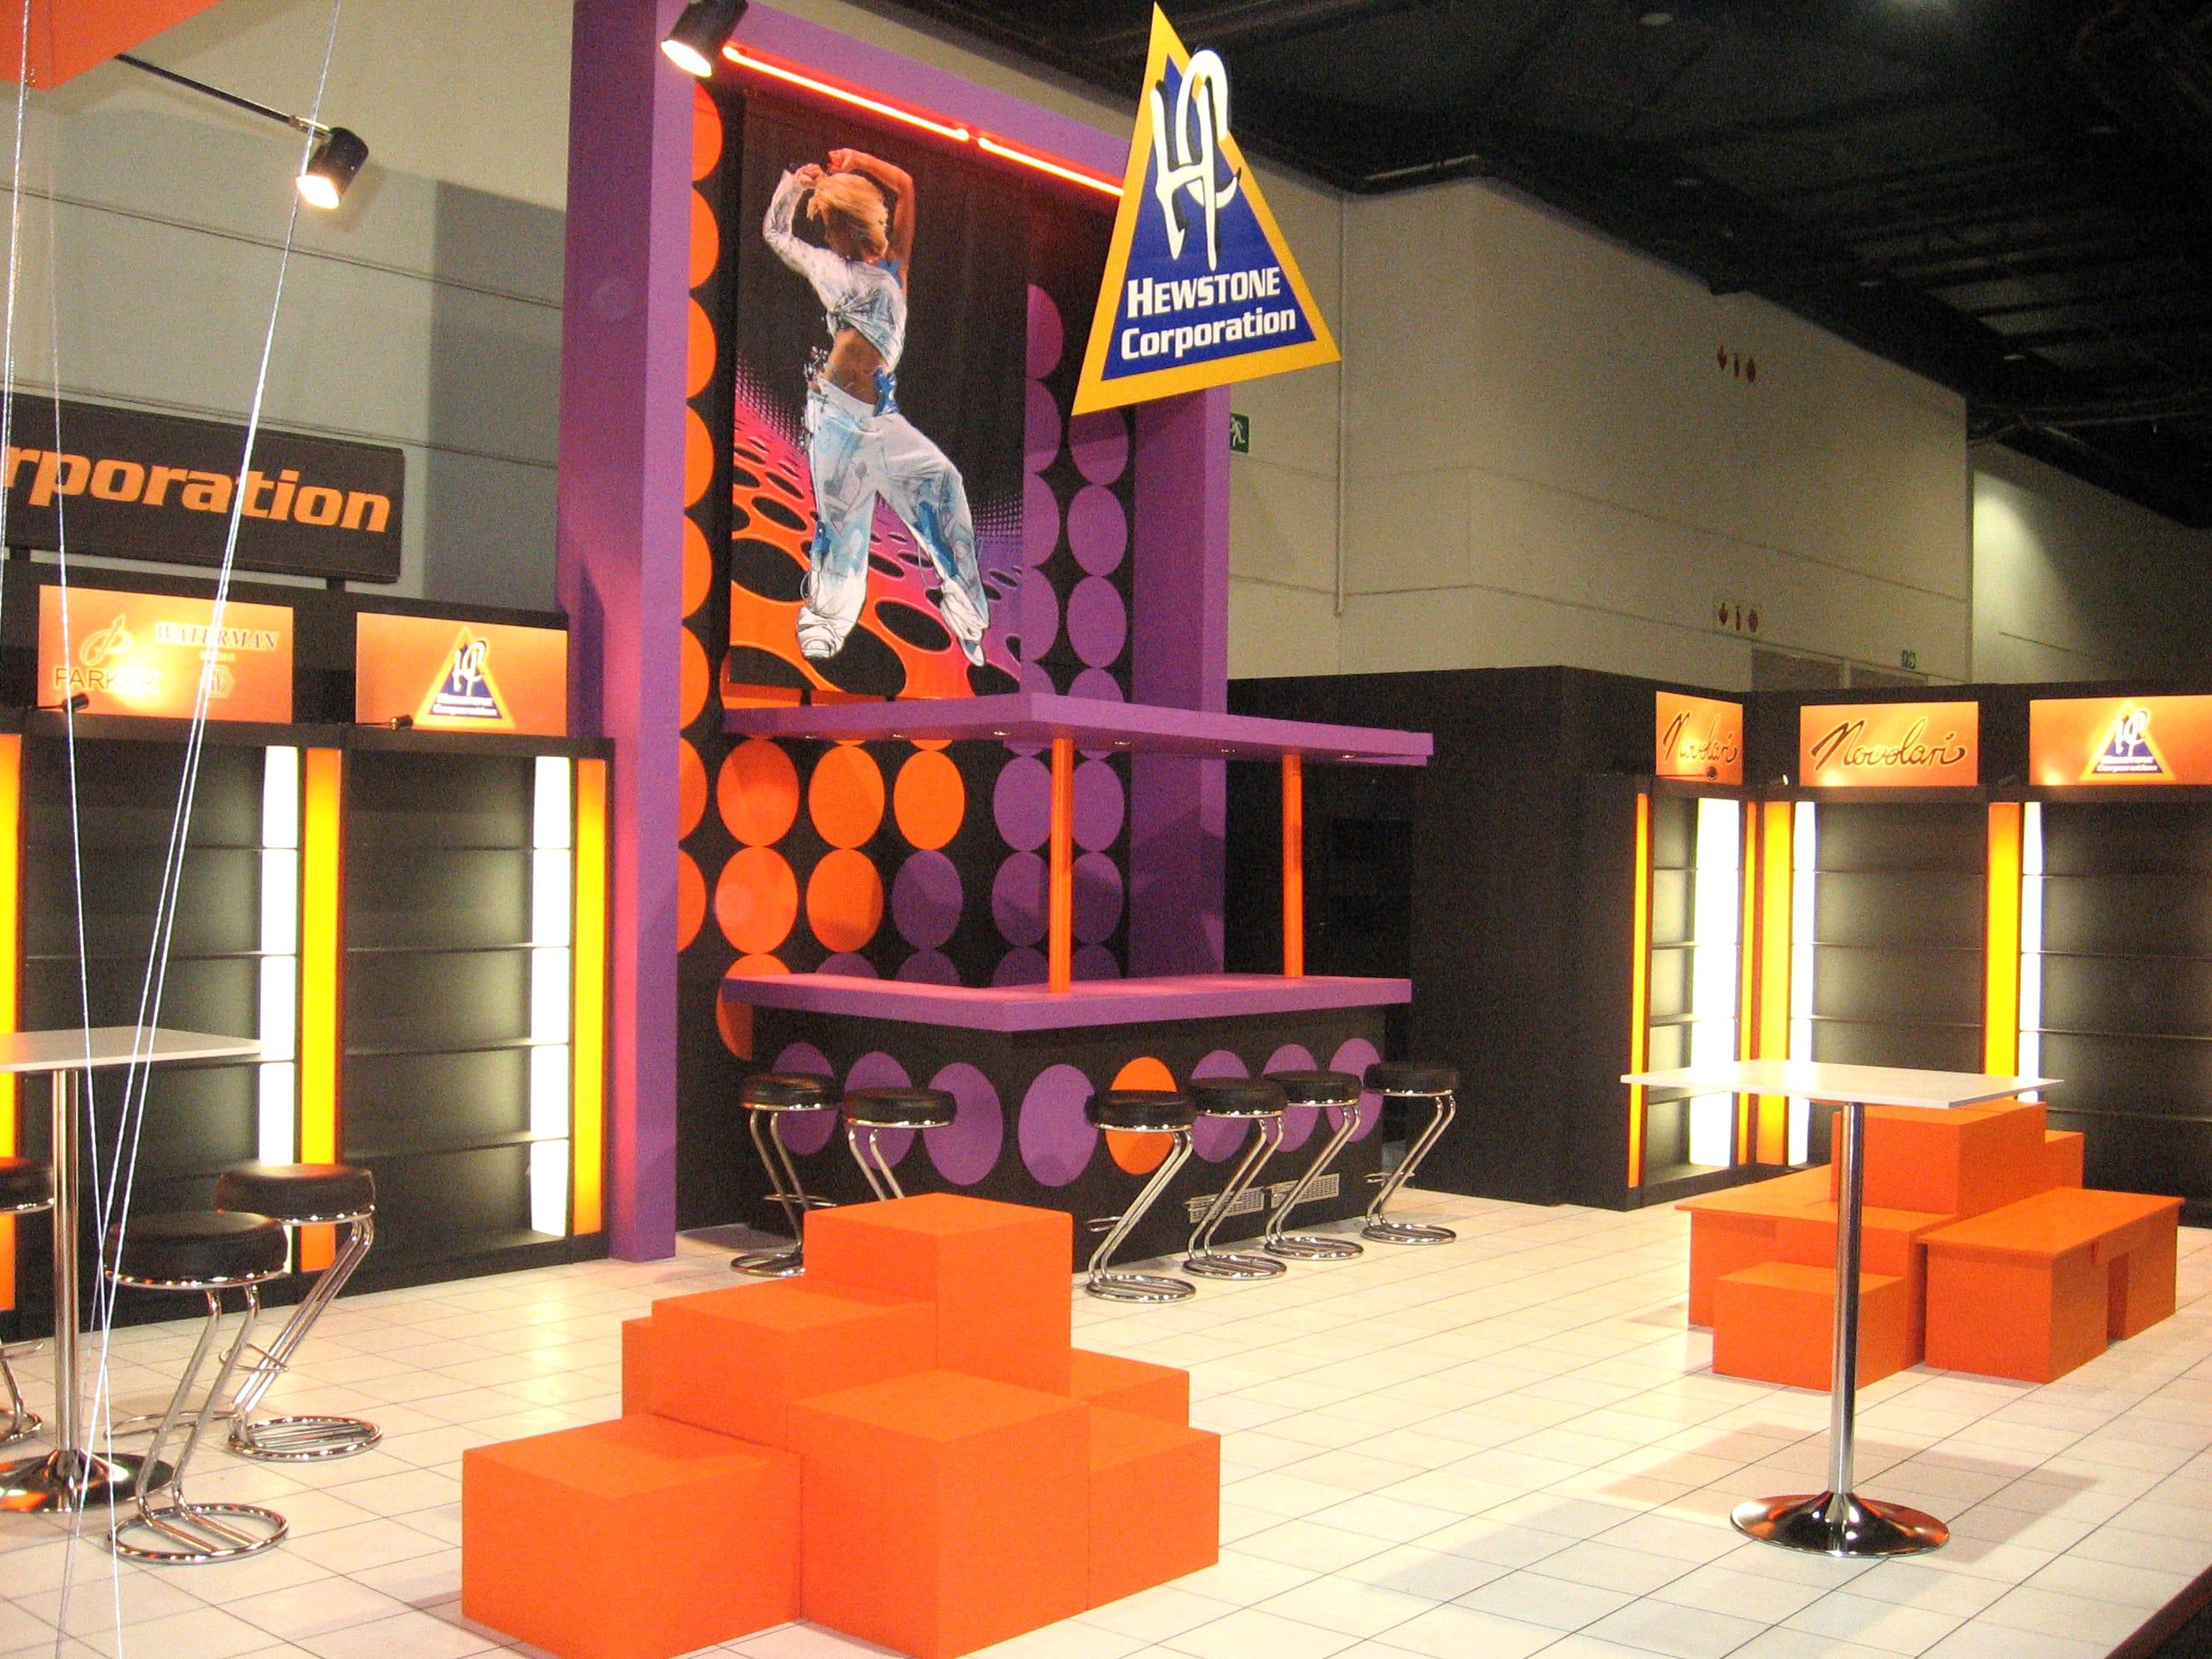 Exhibition Stands - Hewstone Corporation